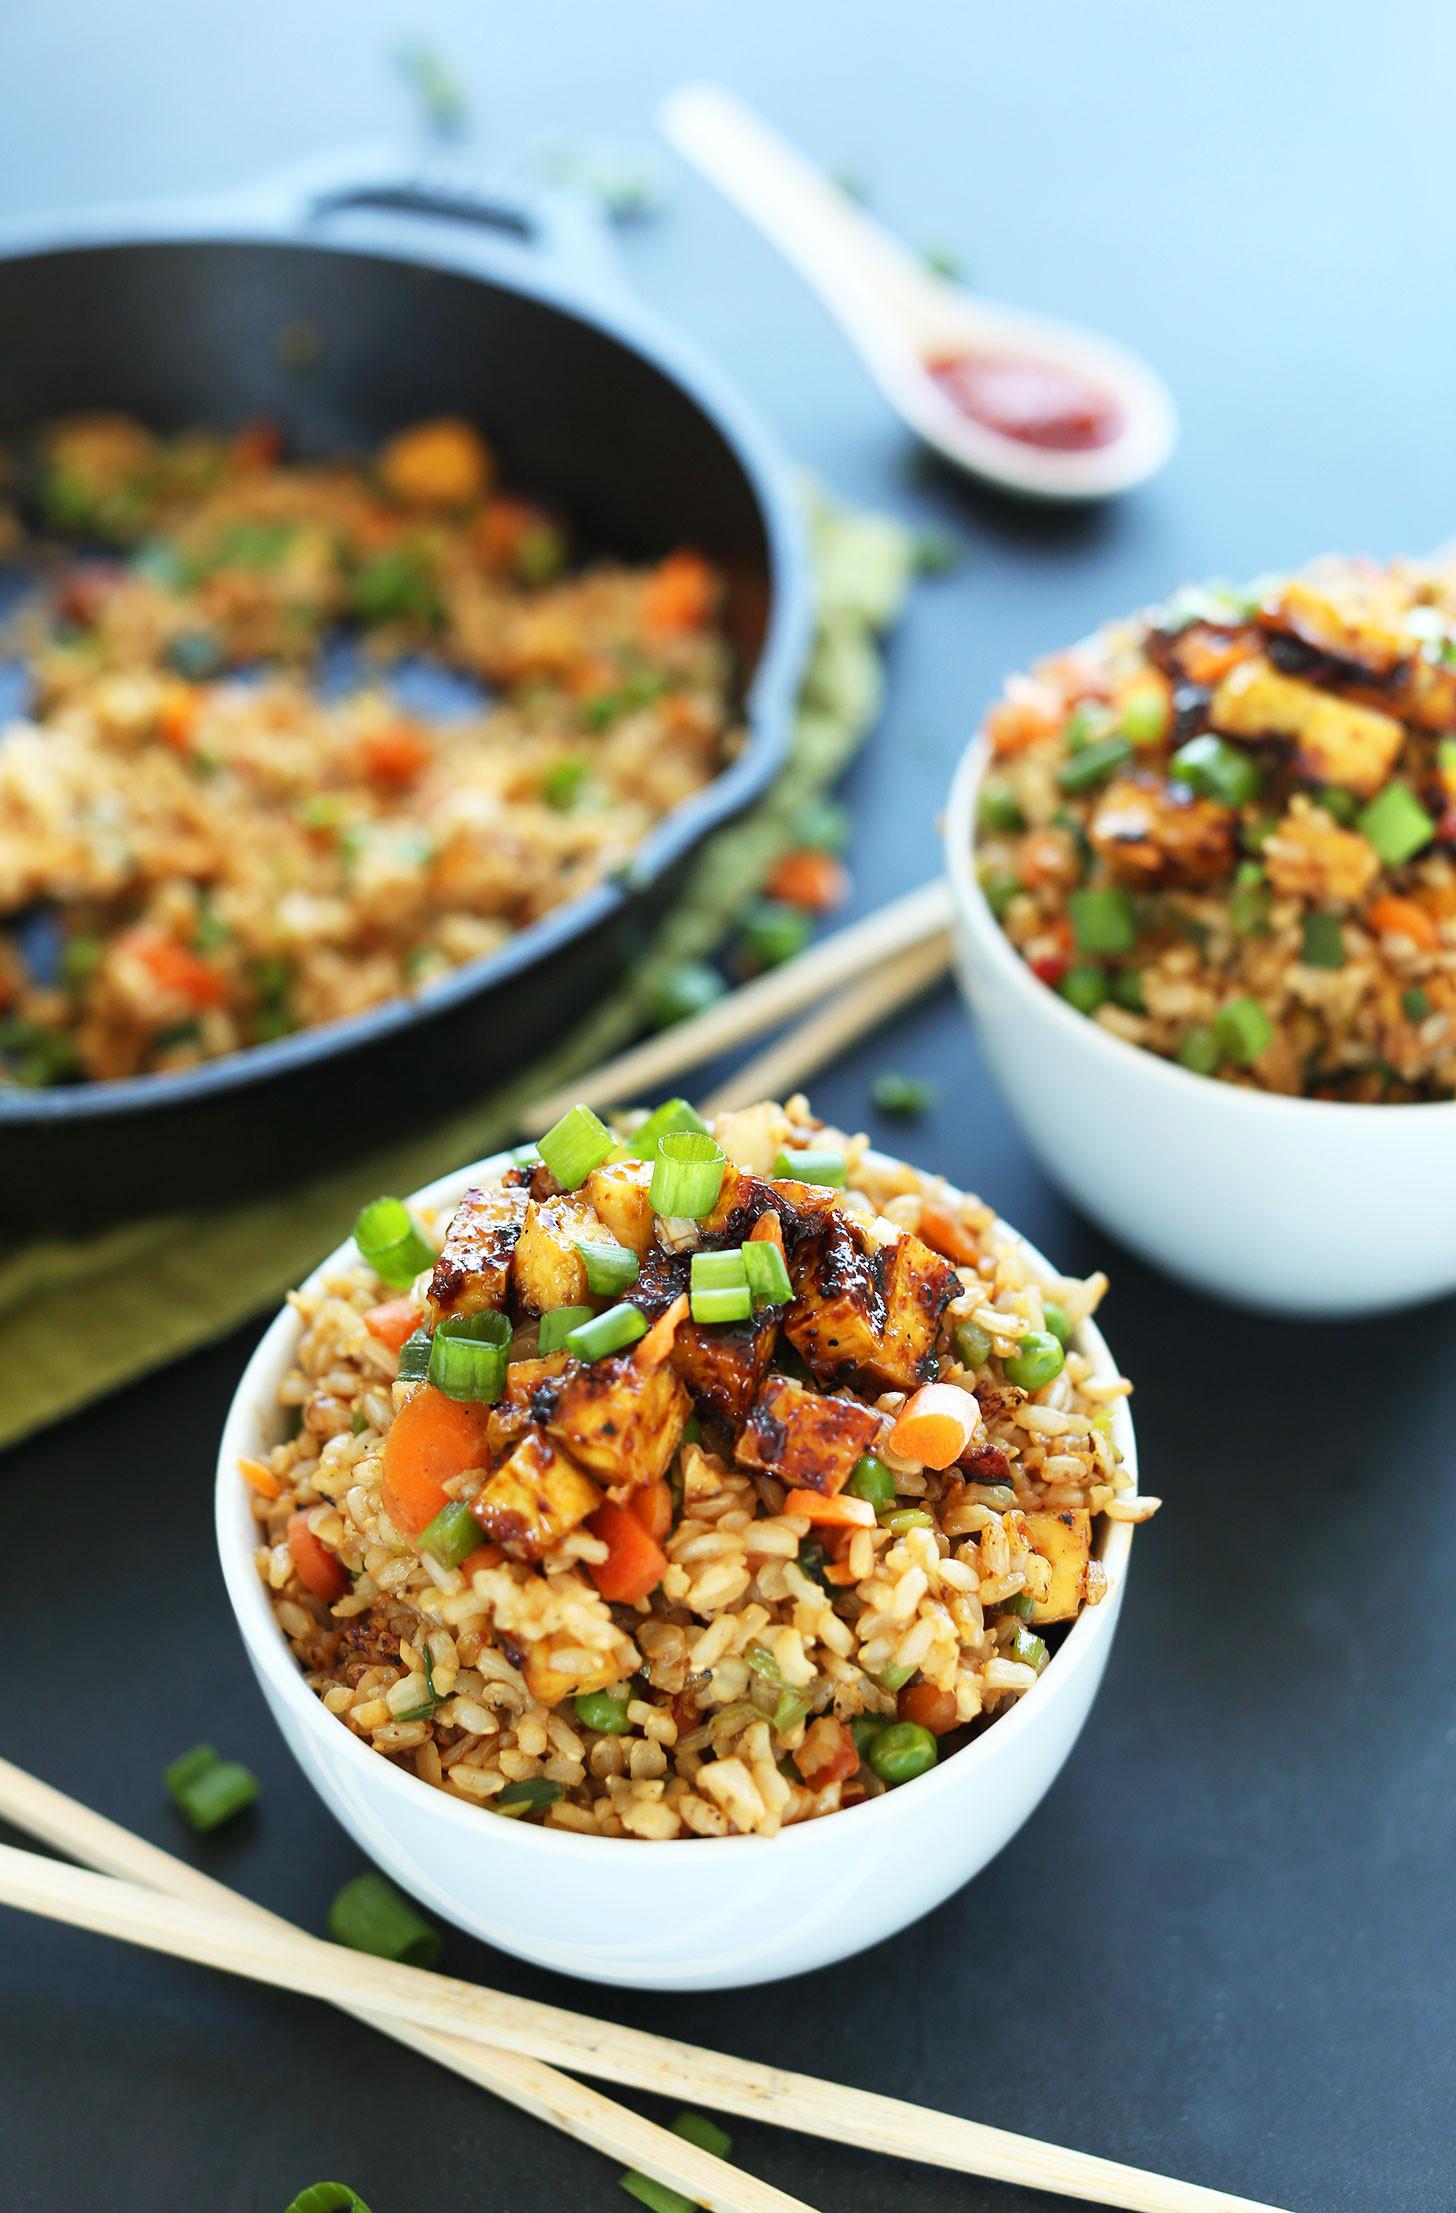 Healthy Easy Vegan Recipes  Vegan Fried Rice